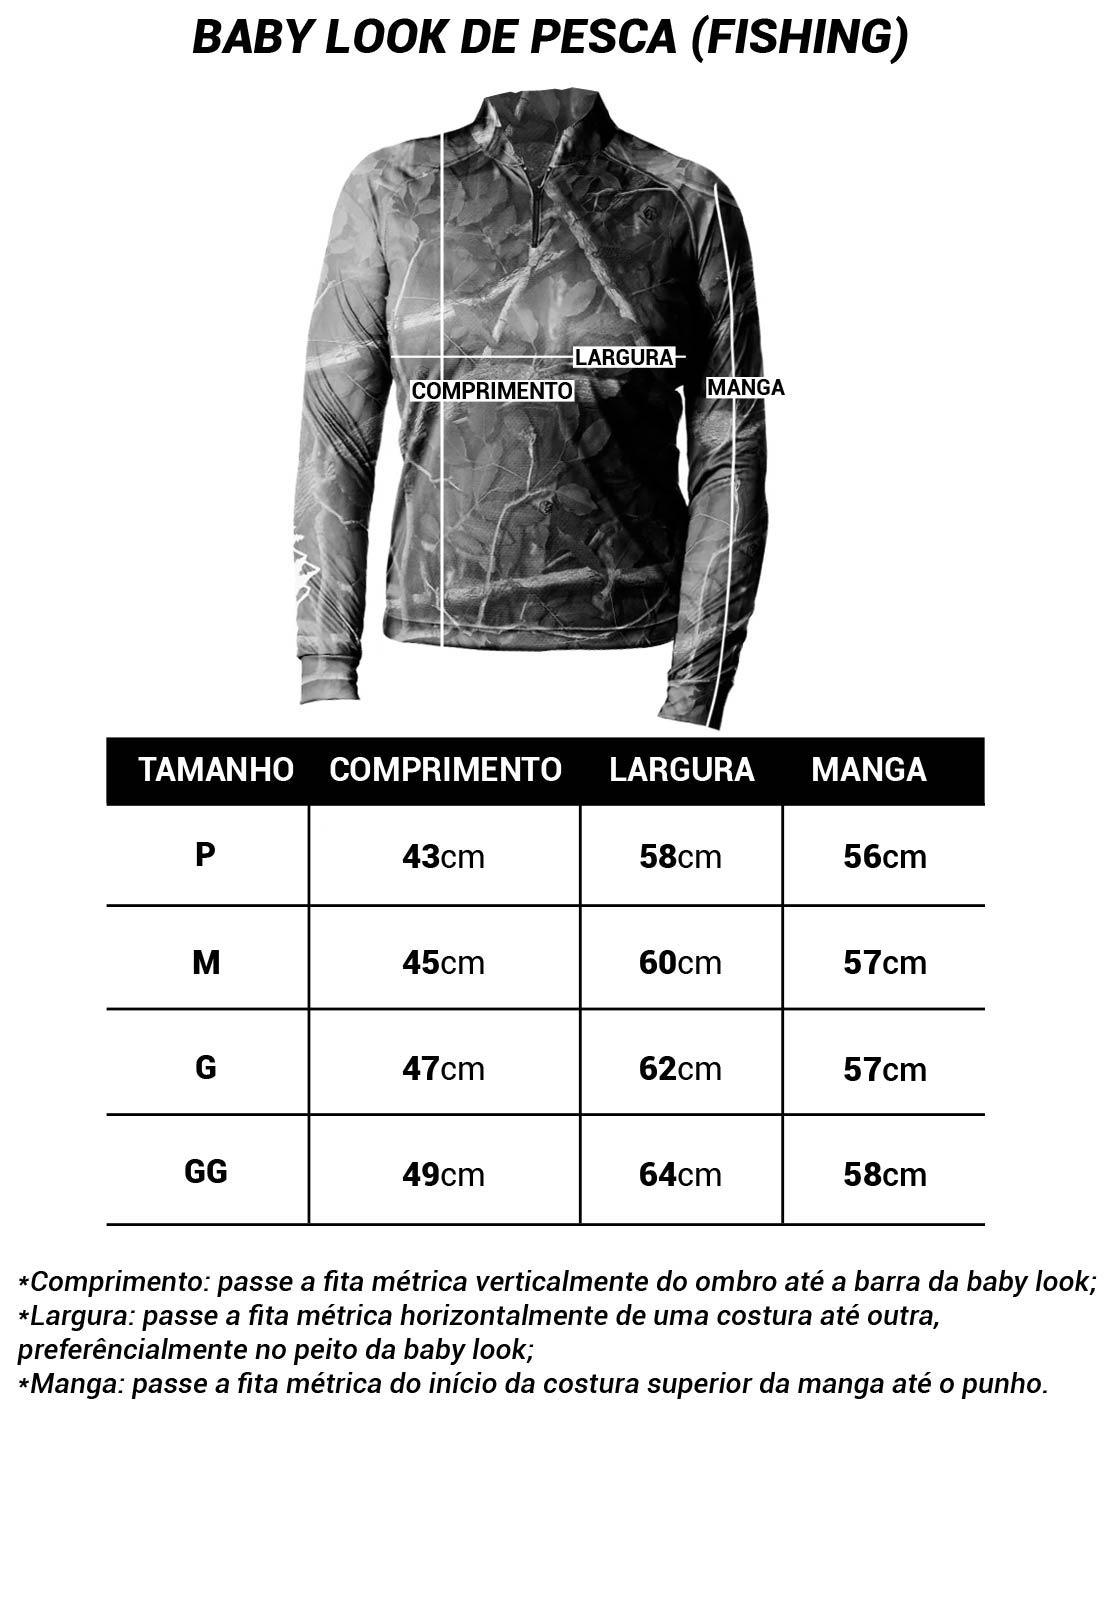 CAMISA DE PESCA FISH CAMUFLADA PRO 15 FEMININA + BANDANA GRÁTIS  - Real Hunter